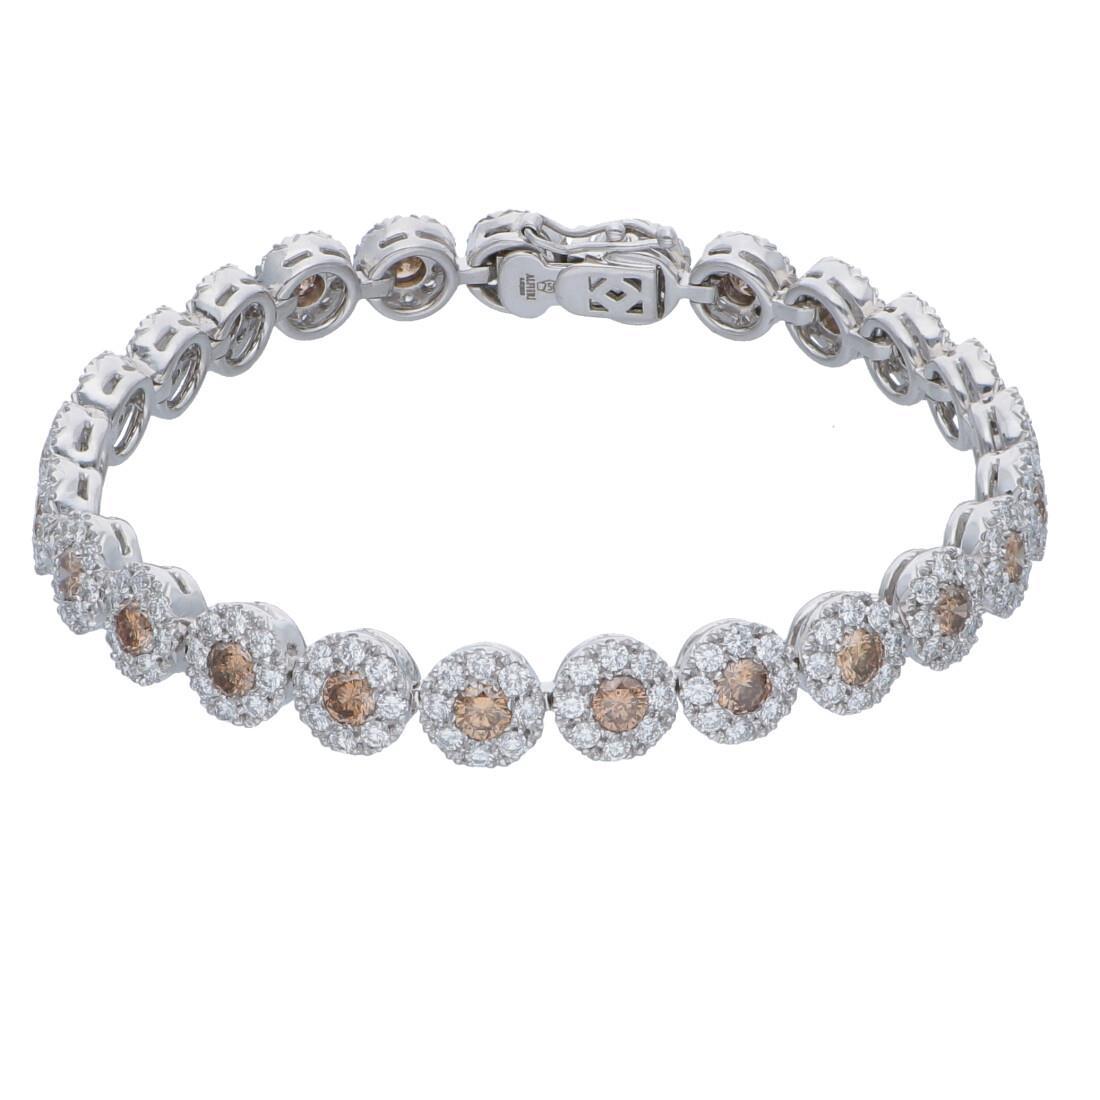 Bracciale con diamanti - ALFIERI & ST. JOHN